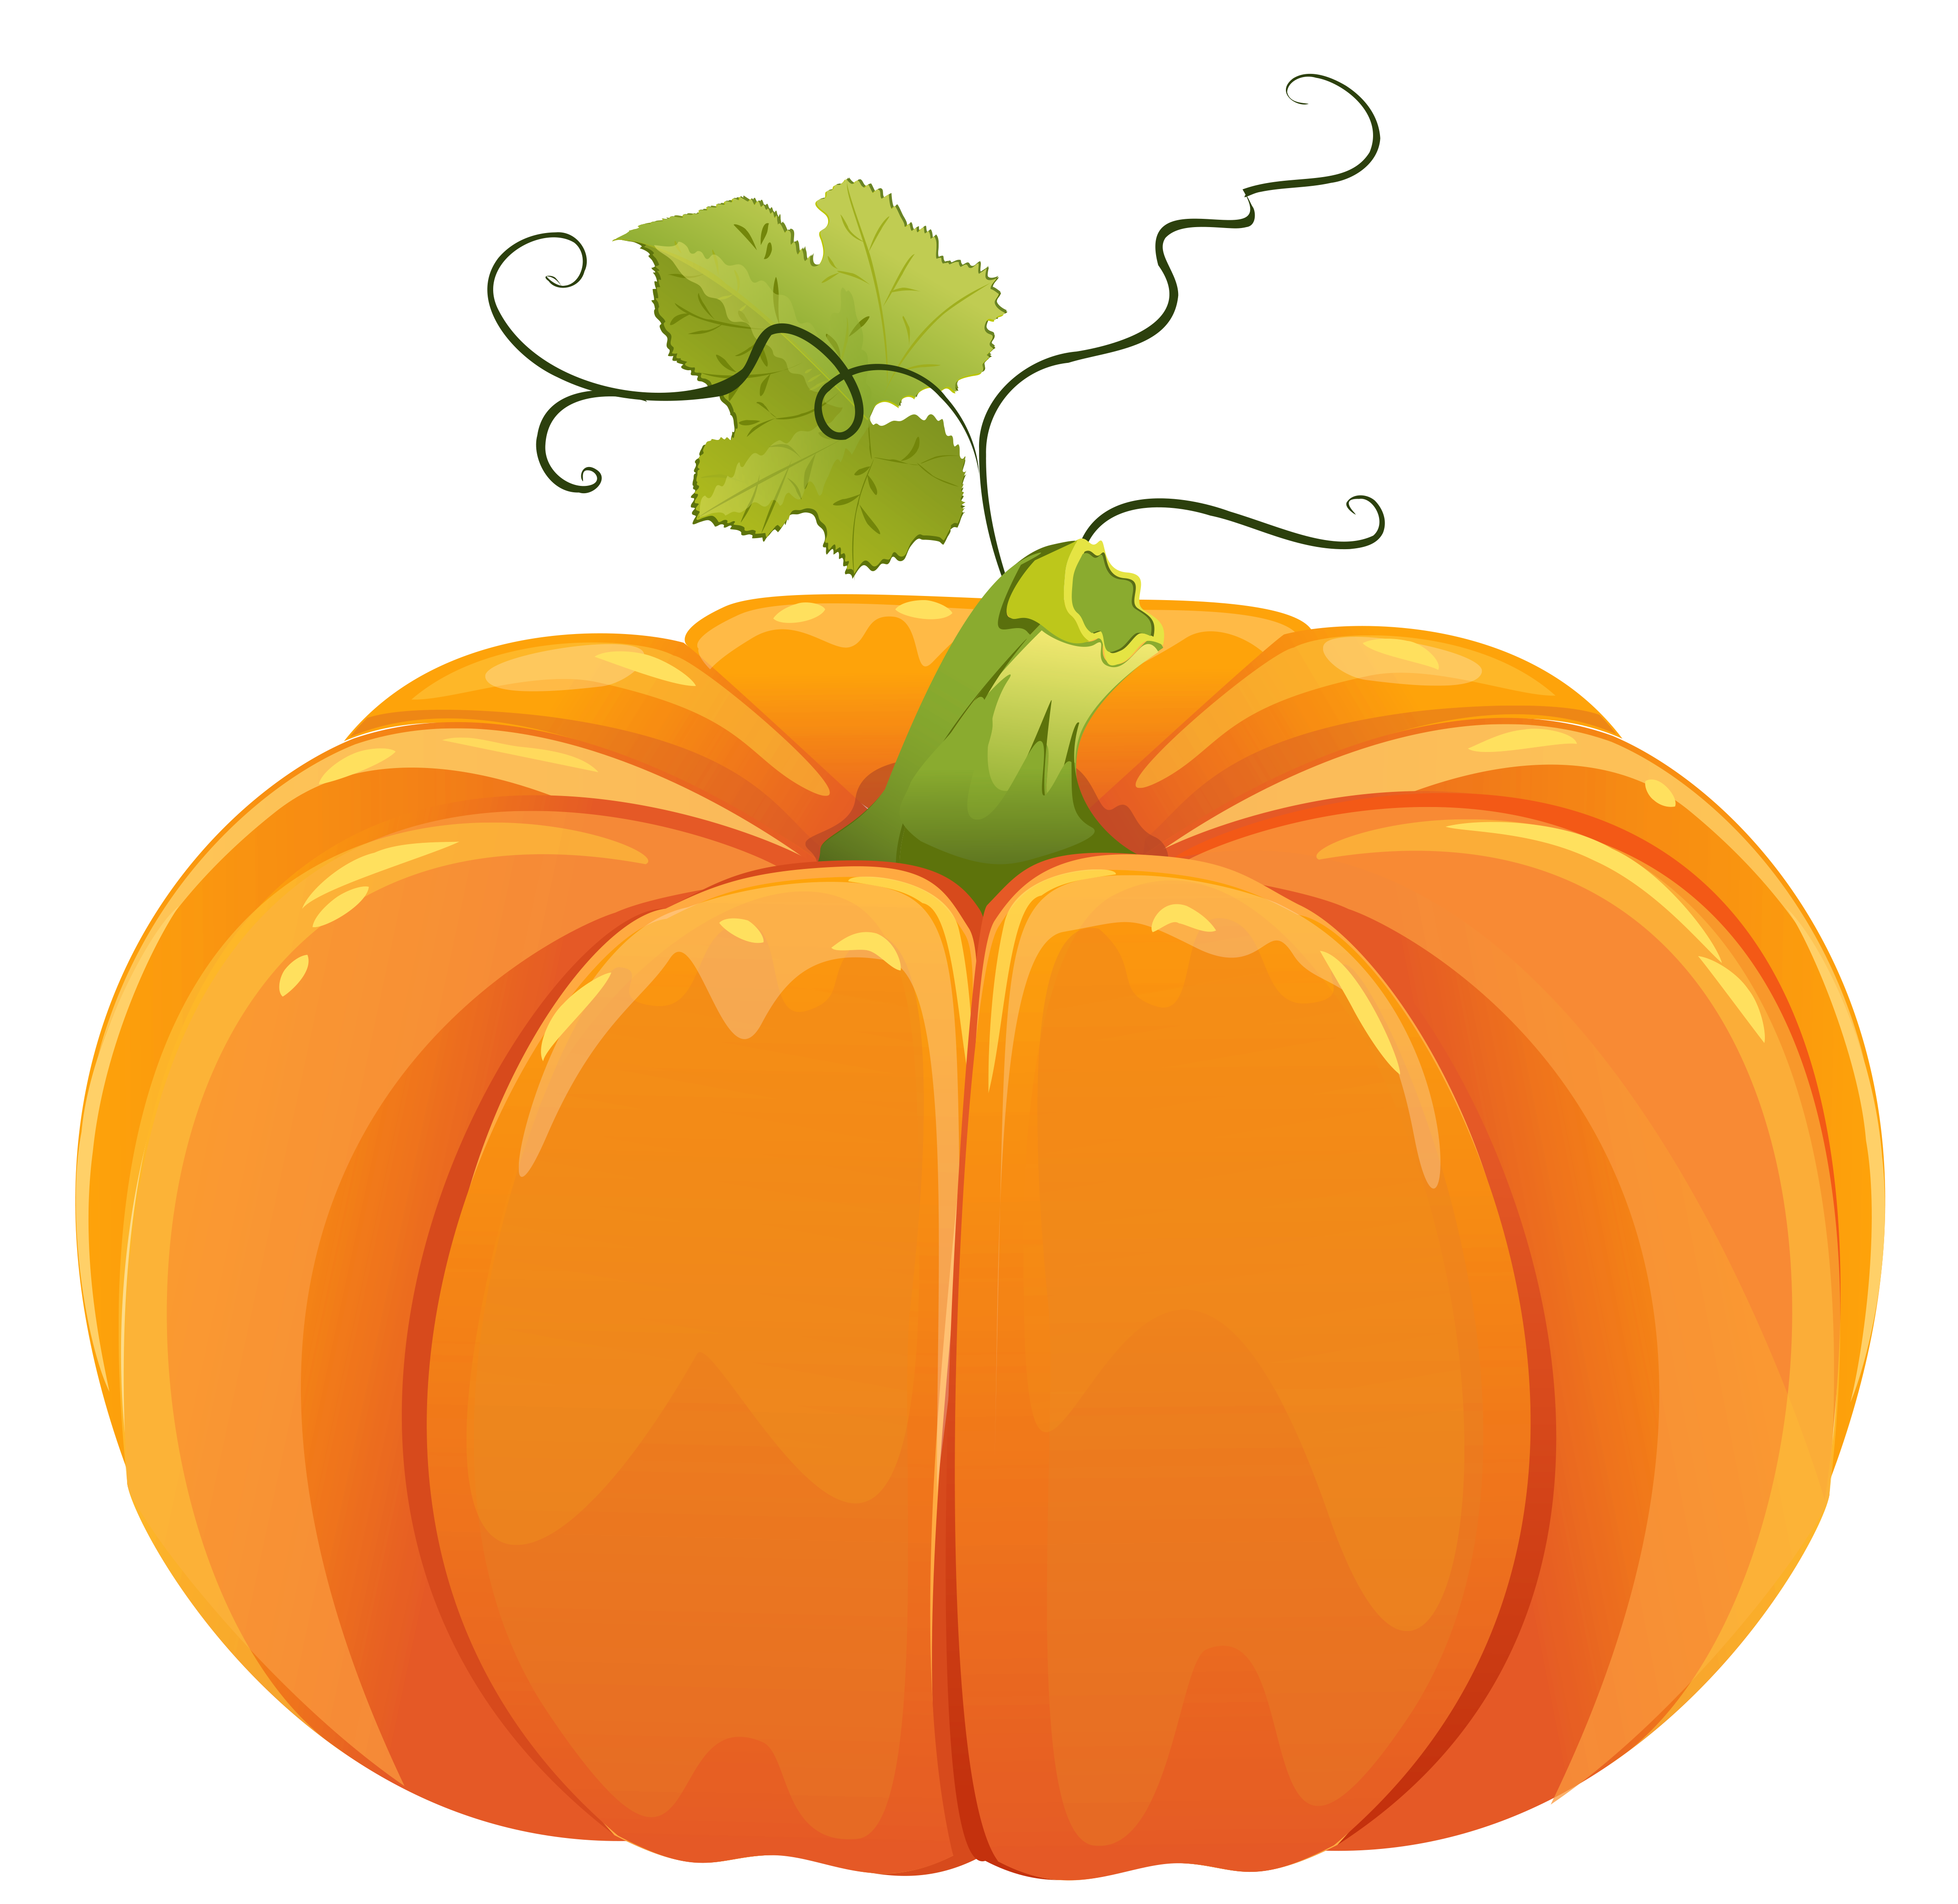 Free Clipart Pumpkins - clipartall-Free Clipart Pumpkins - clipartall-16